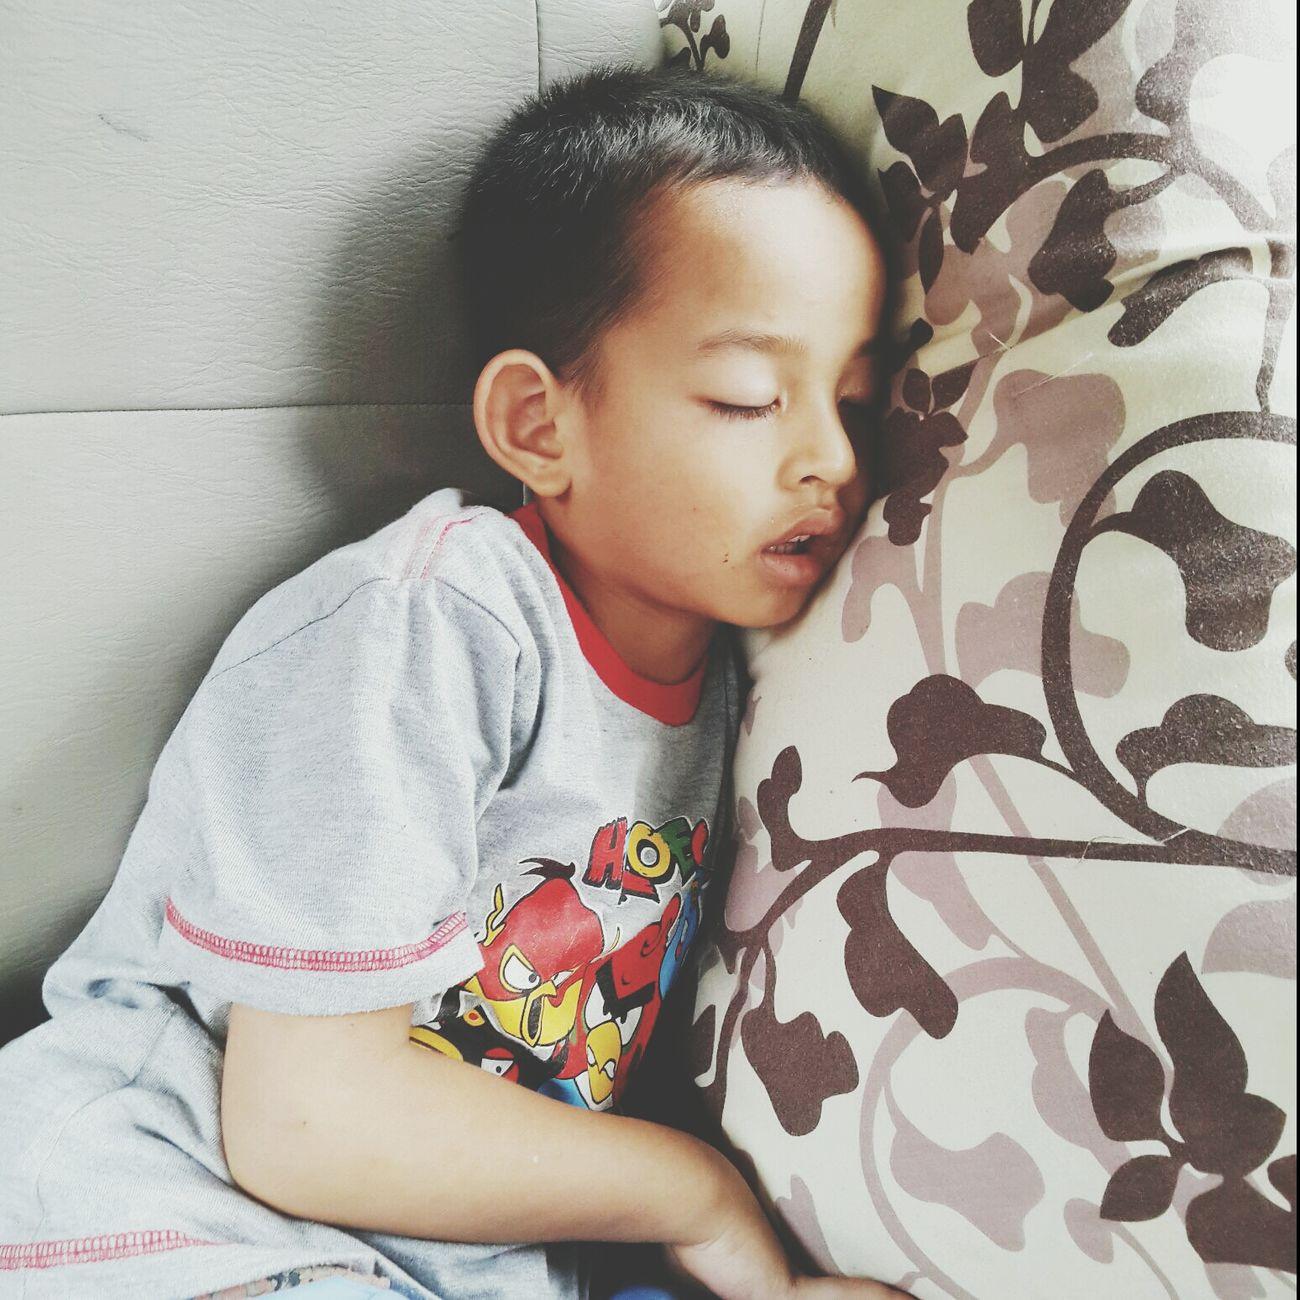 Steph Filter Sleepyhead Nephew  Bandung